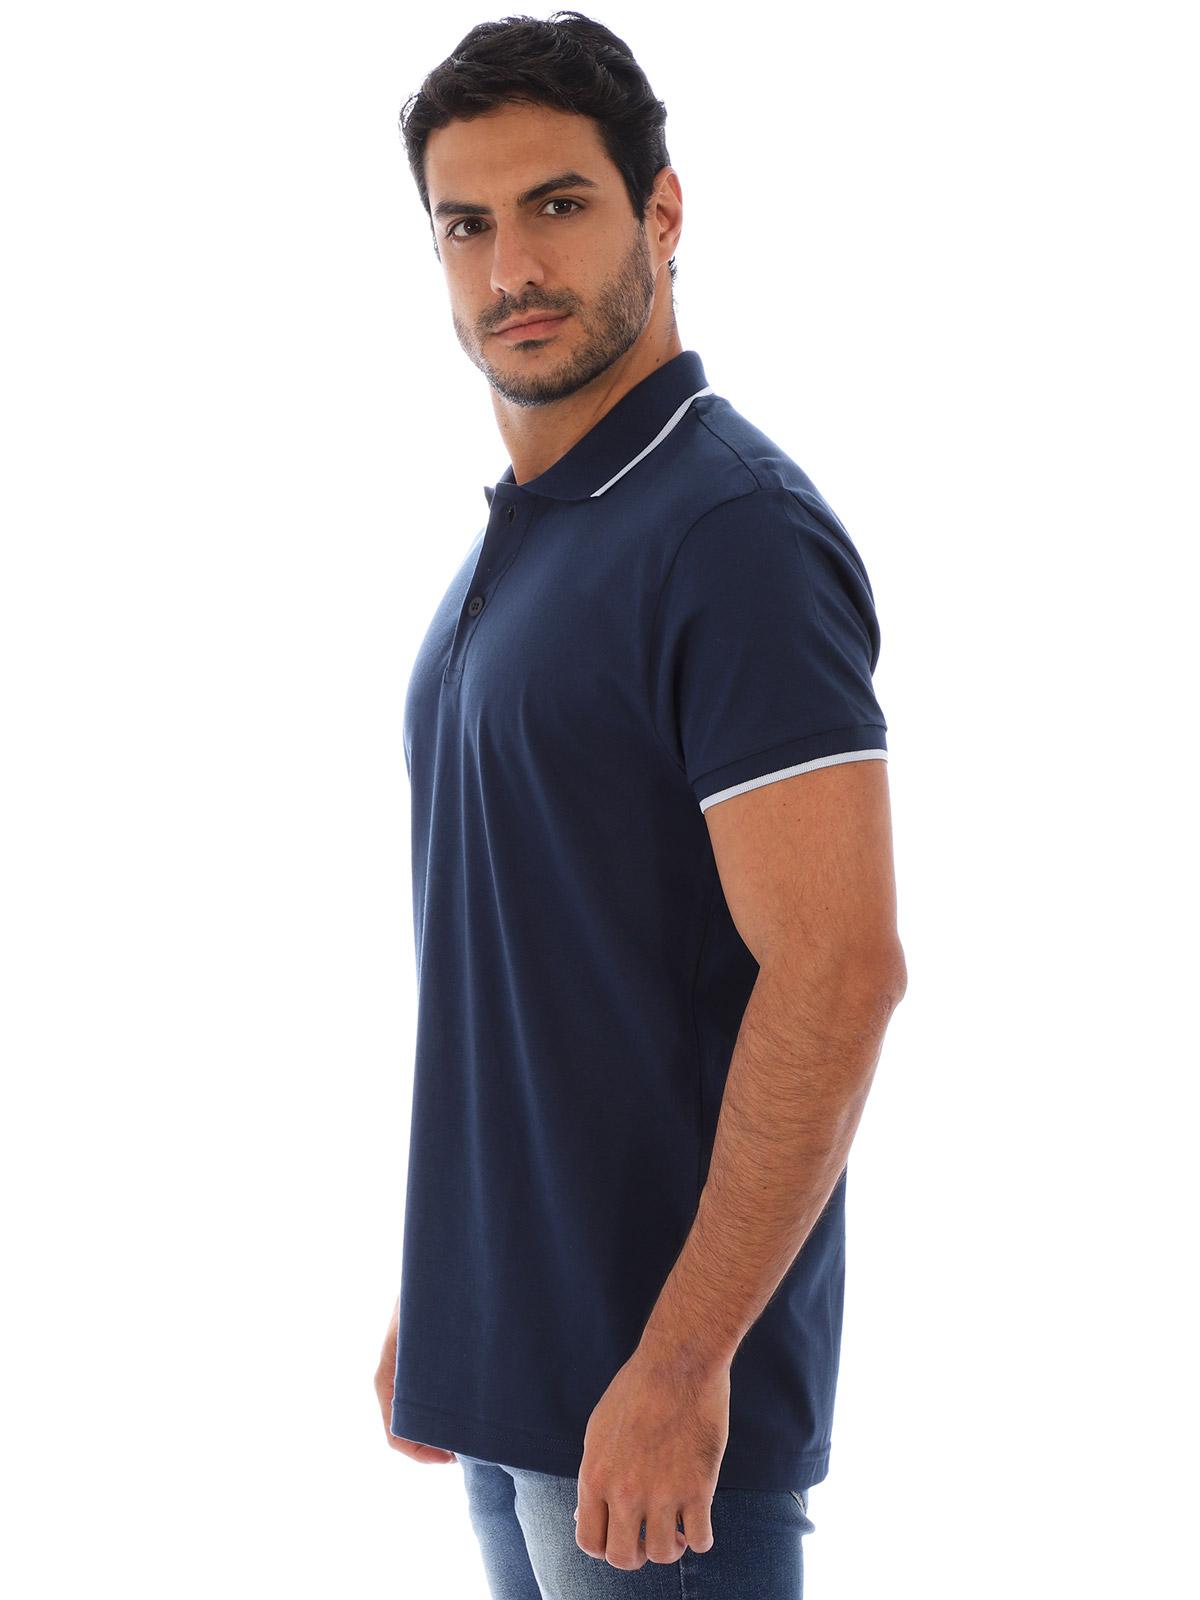 Camisa Polo Masculina Lisa Com Punho Filete Azul Marinho